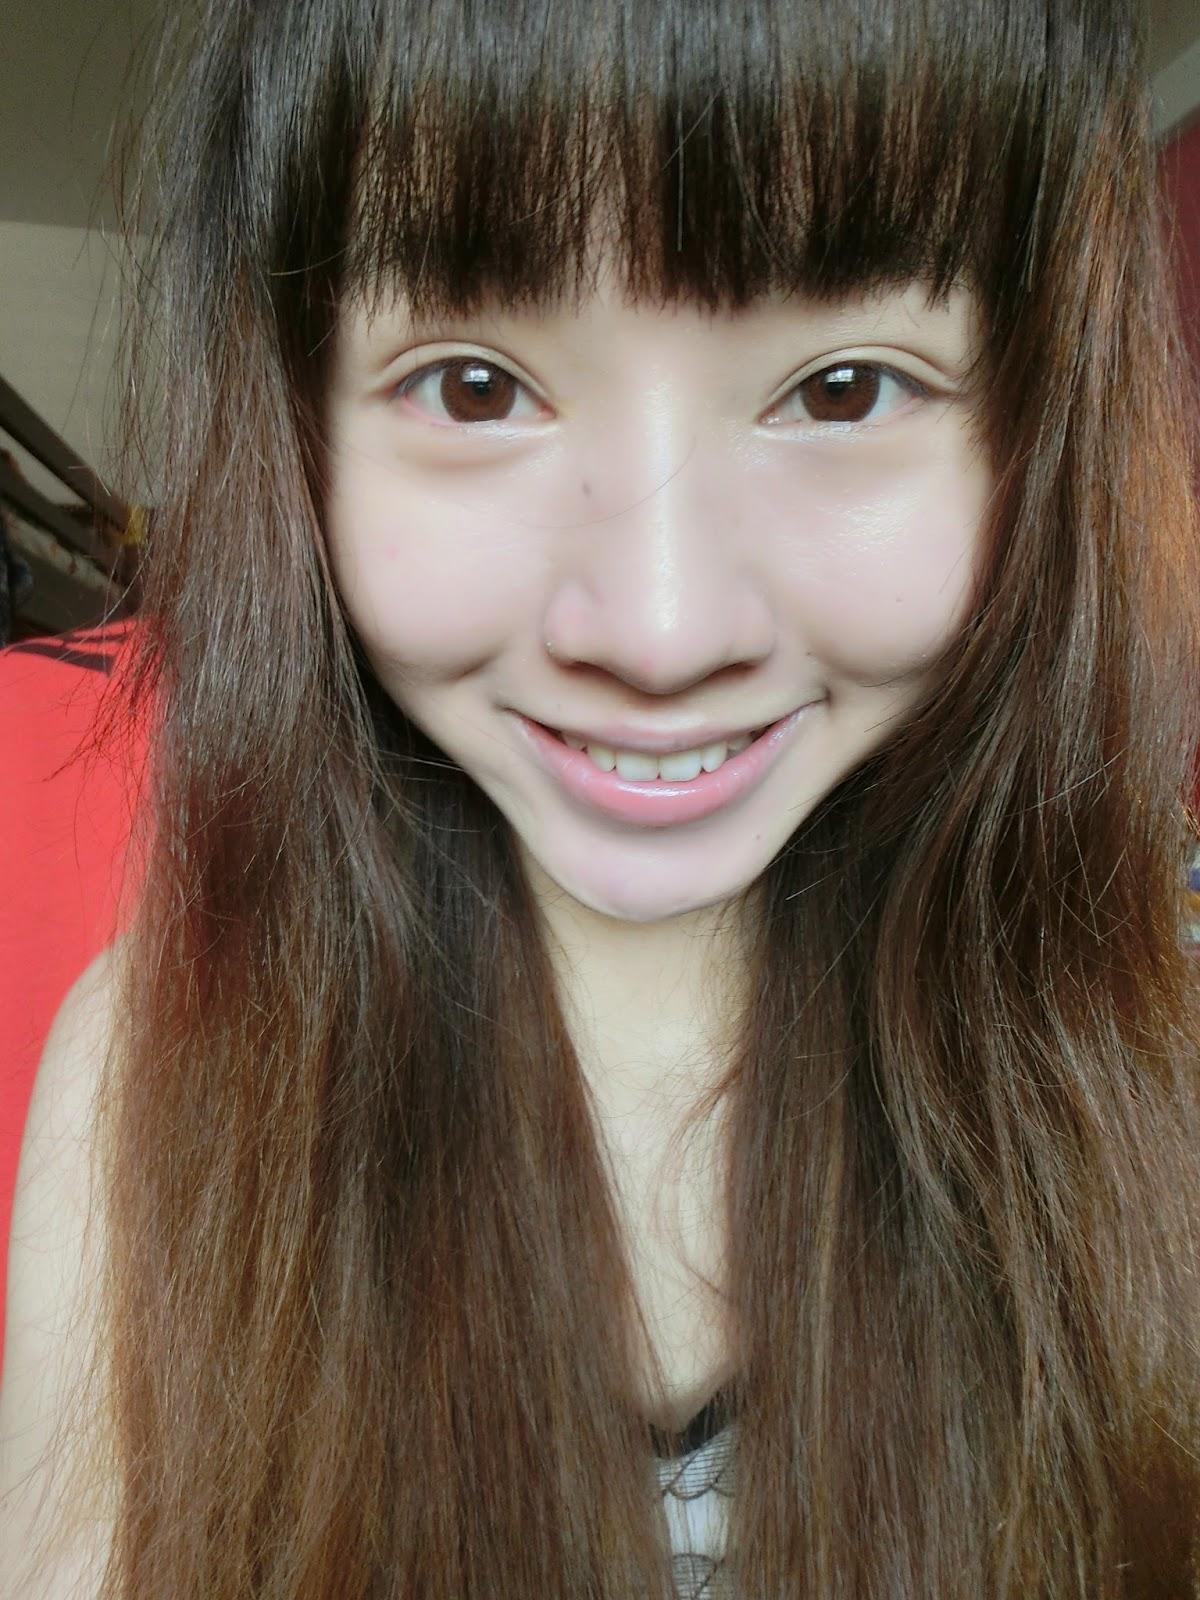 Rachelrachx Japanese Innocent Doll Eye Makeup